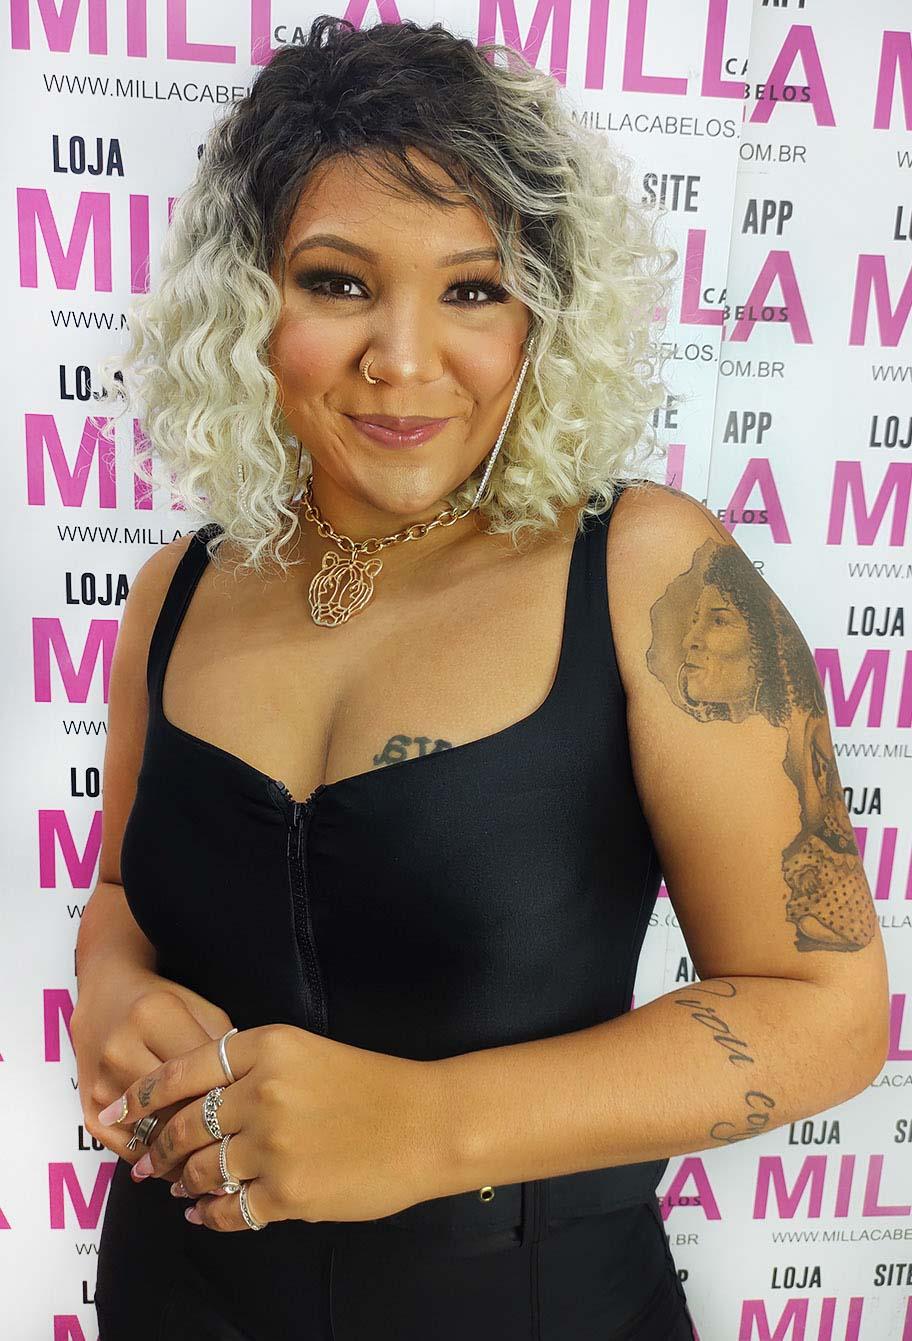 Peruca Orgânica - Front Lace Sleek Wig Fashion True Me - Rapunzel